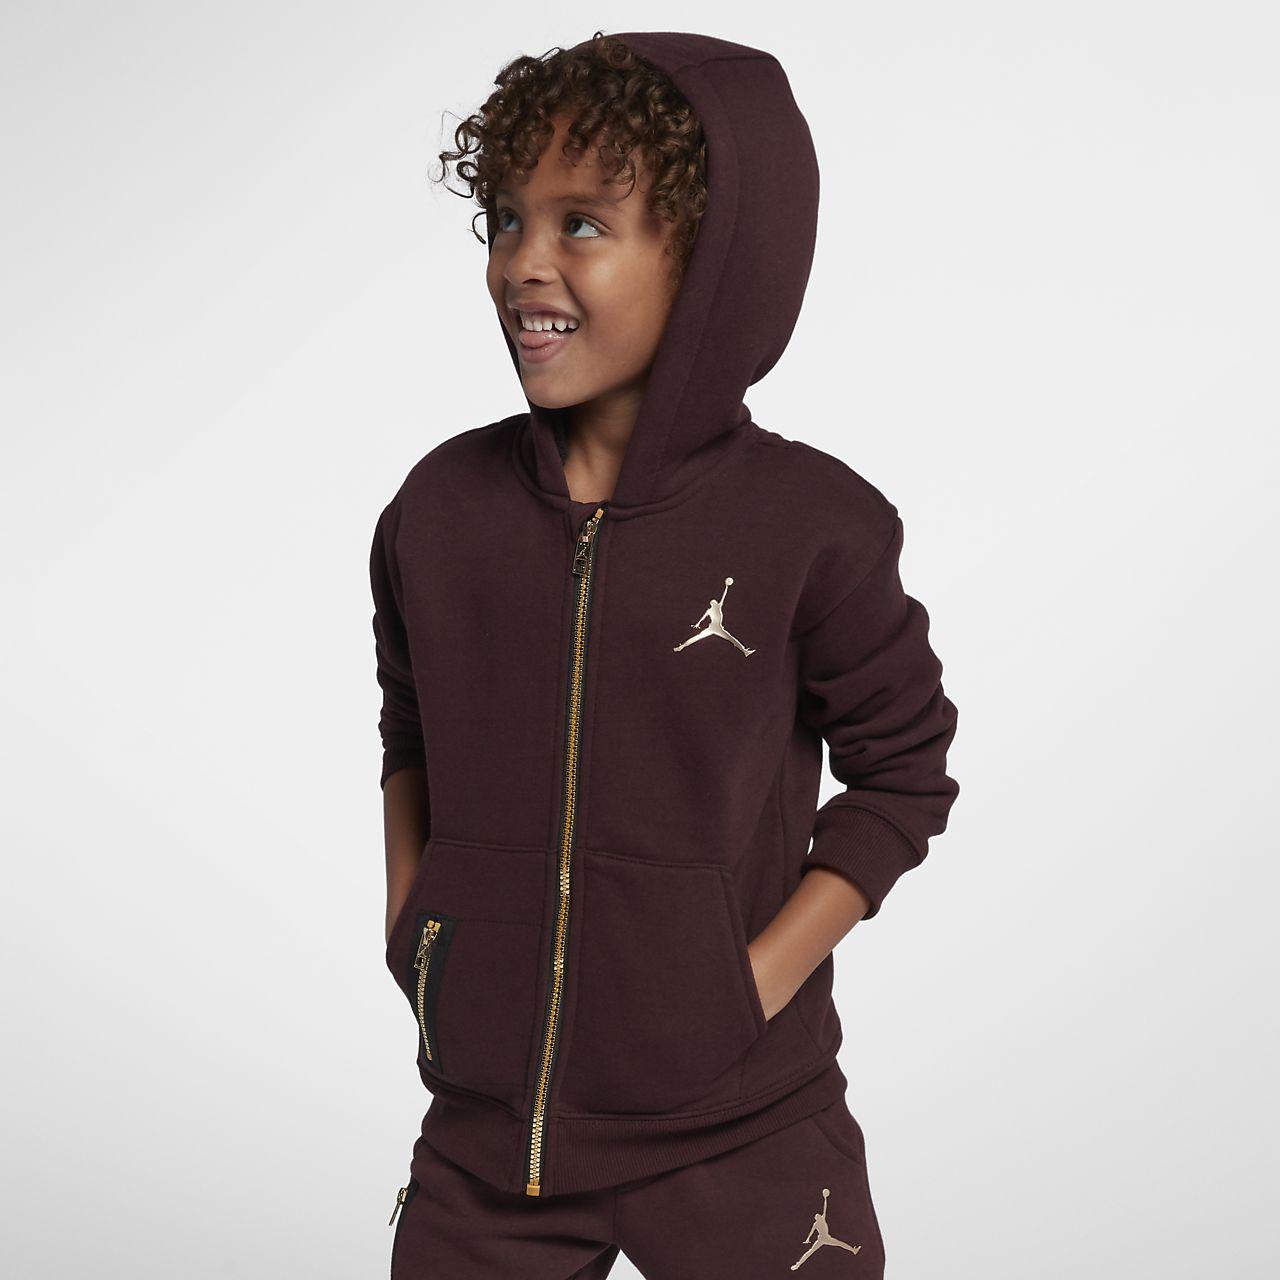 Jordan Younger Kids' Full-Zip Hoodie